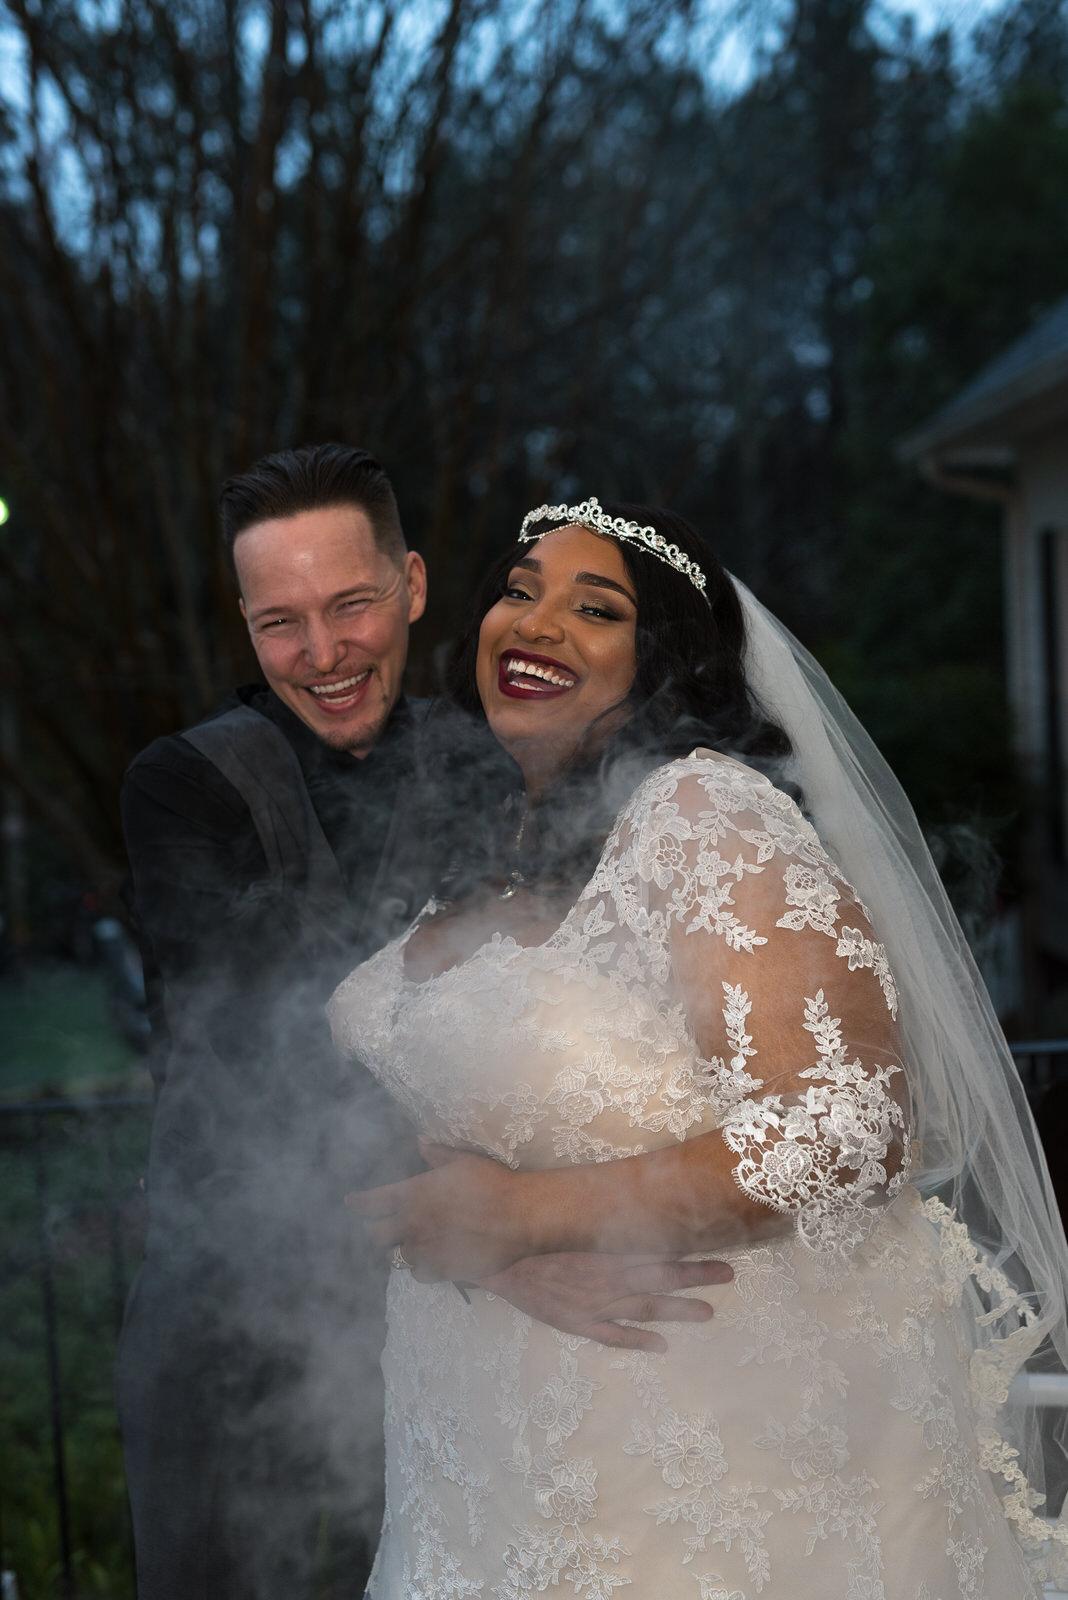 Professional Photographer, wedding photography, portraits, business portaits, people, family photos